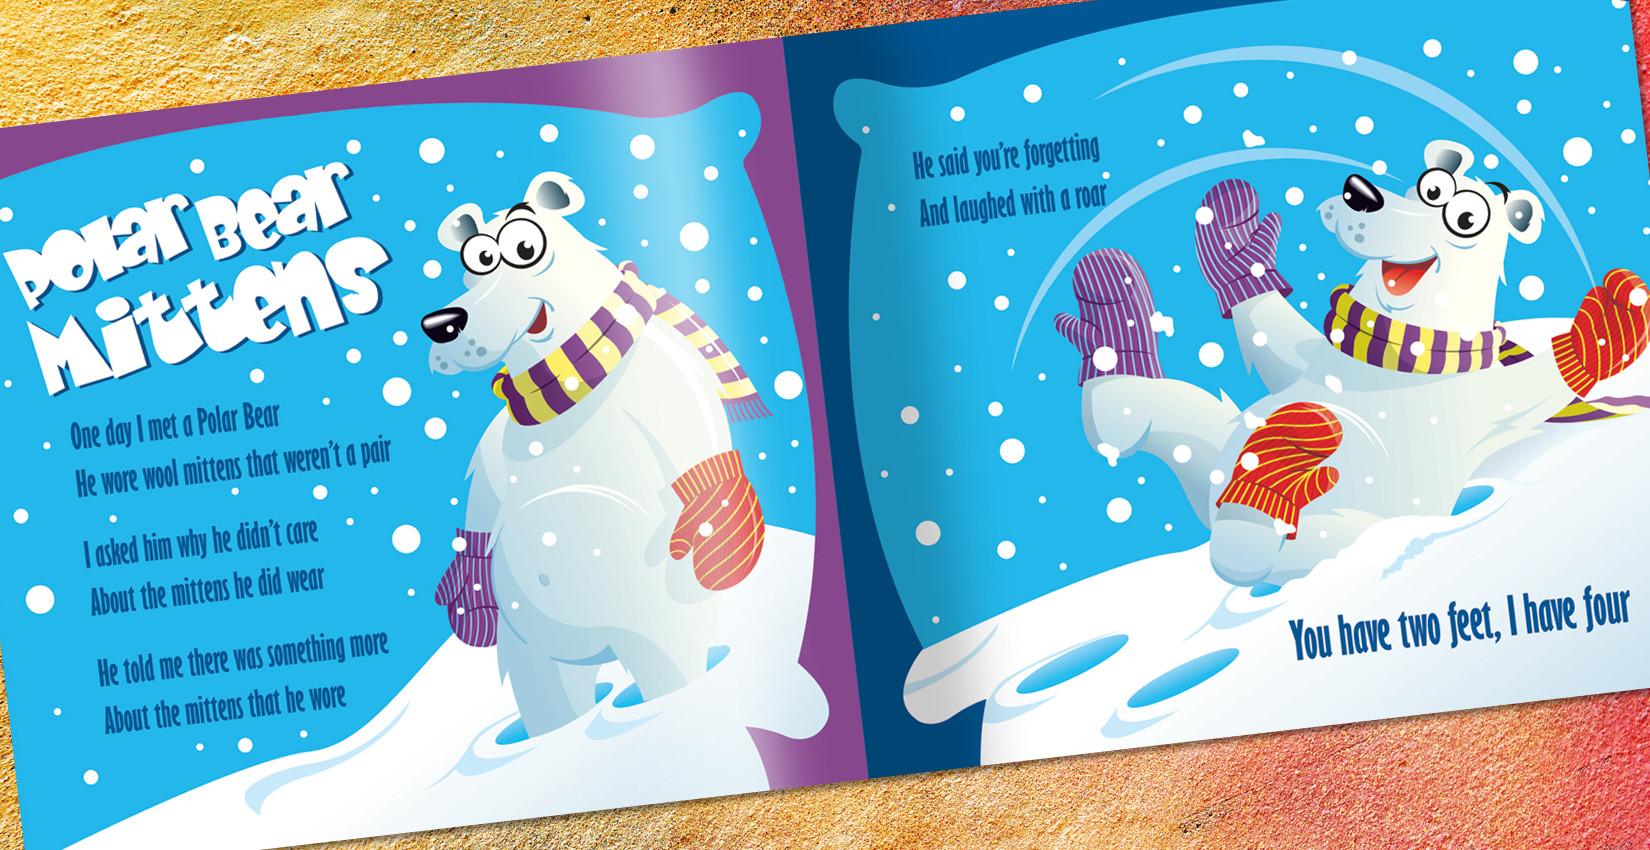 Polar Bear Mittens.jpg